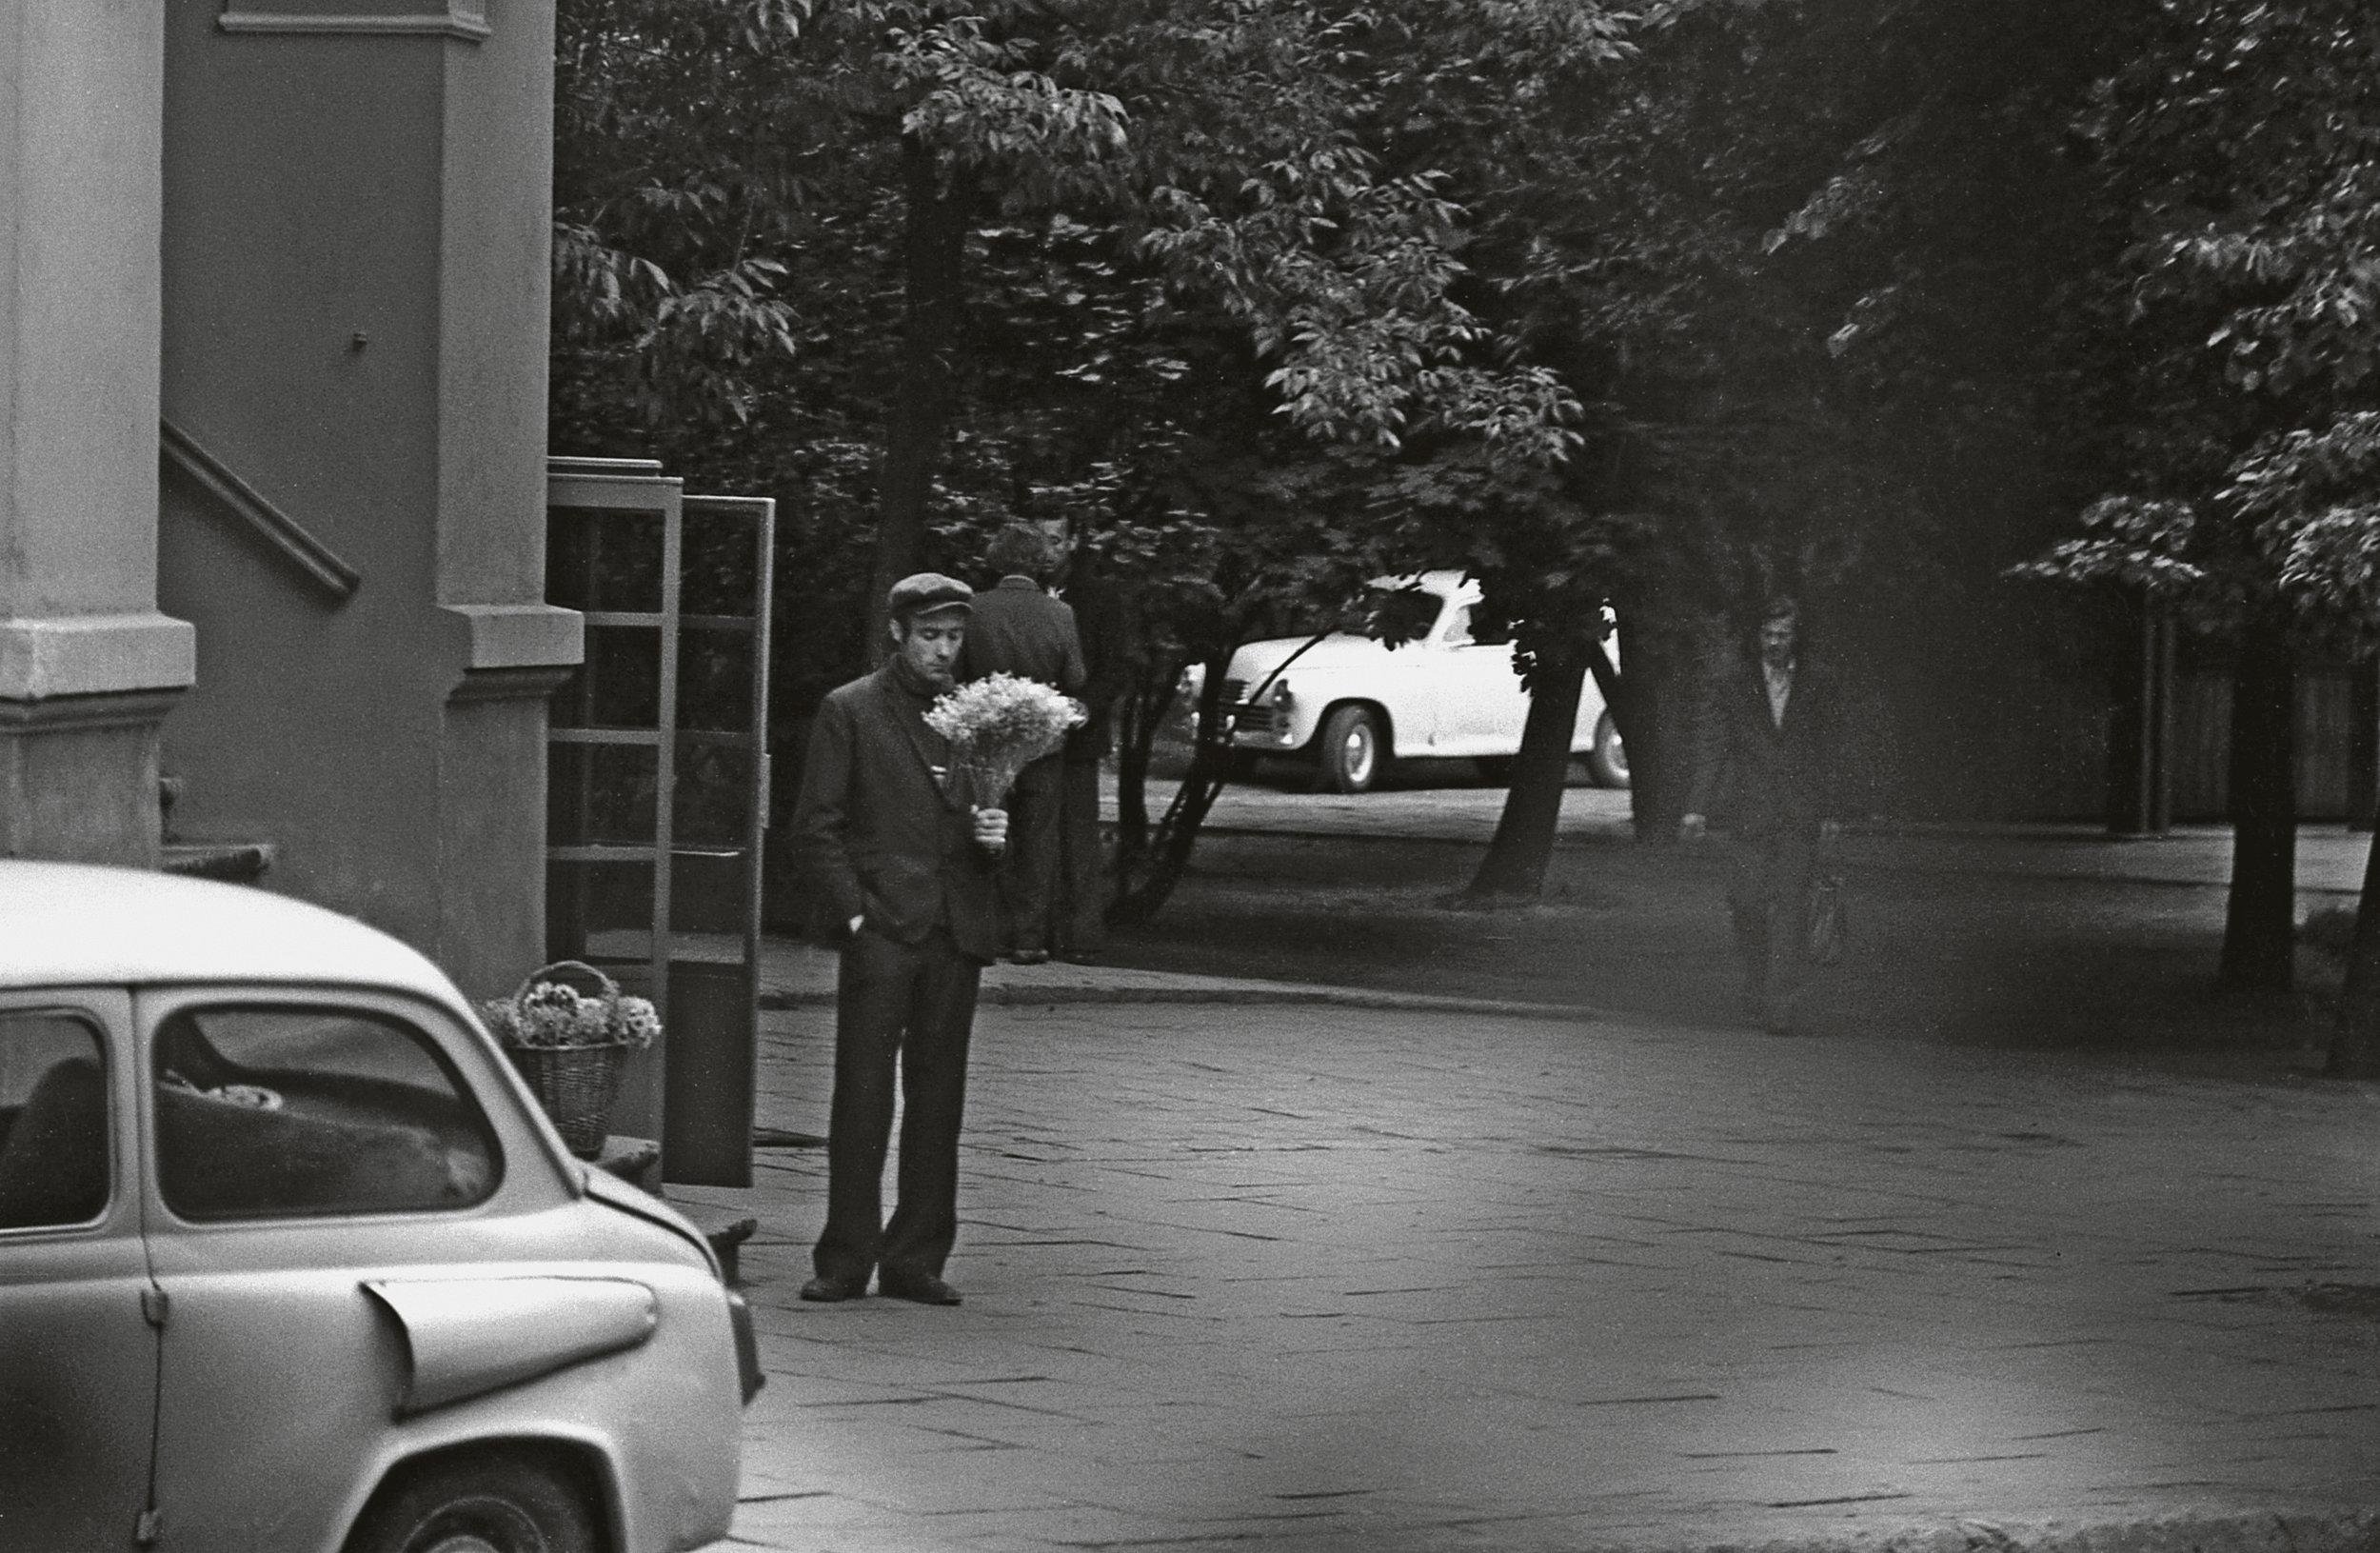 Algirdas   Šeškus,   Lyrics of Love   . 1975-1977.  Daily Life: Photography from Lithuania   on view at The Print Center, Philadelphia.